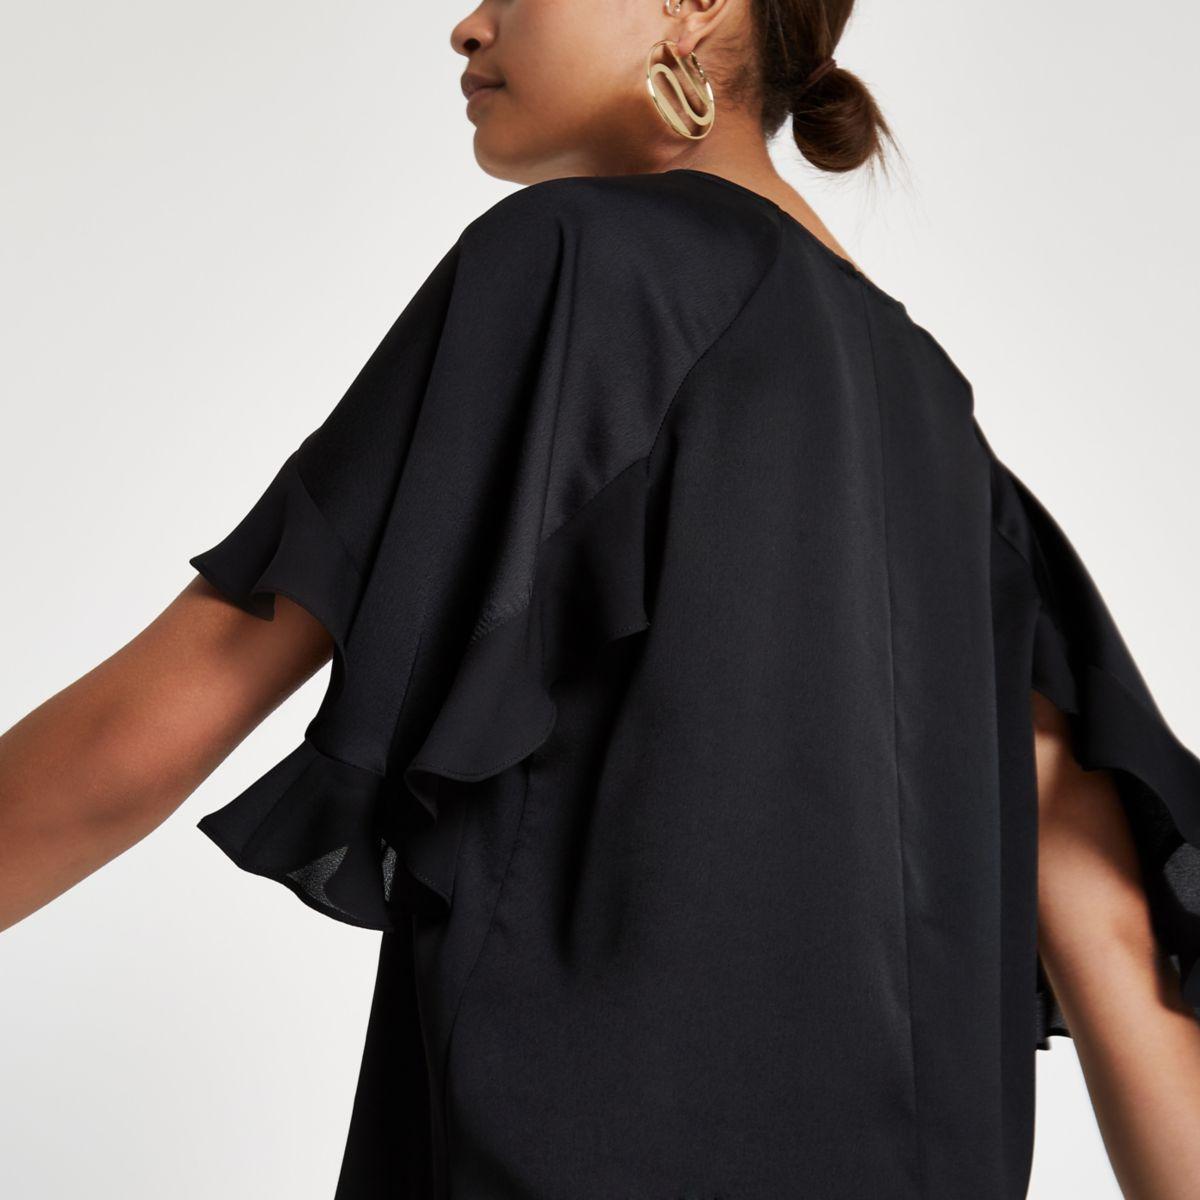 Black satin frill sleeve top